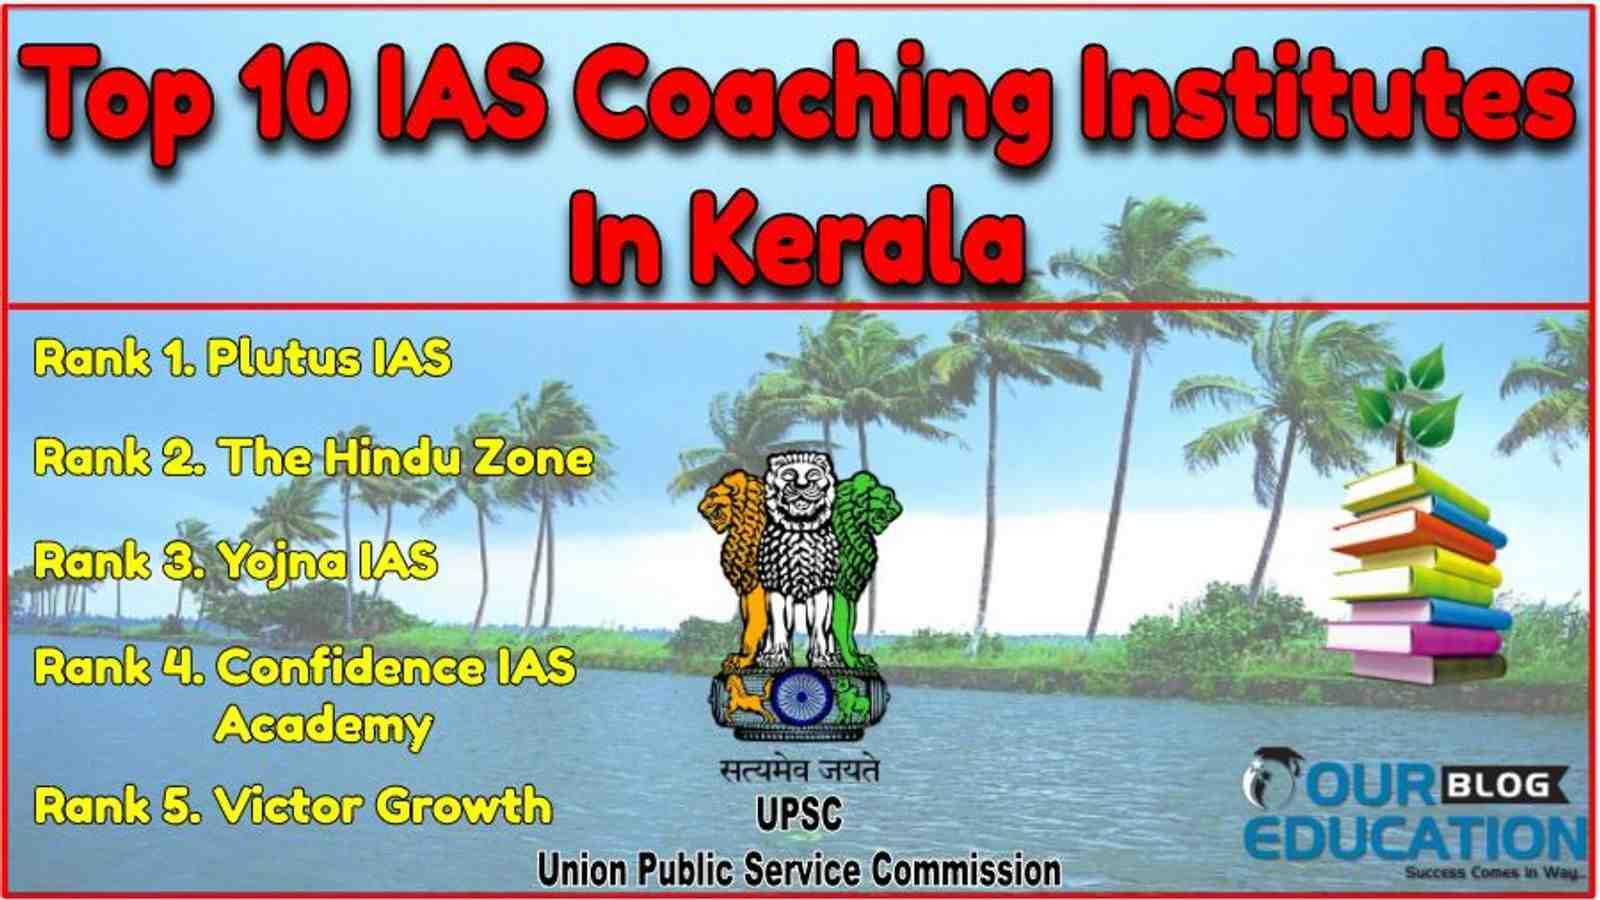 Top 10 Ias Coaching Institutes In Kerala